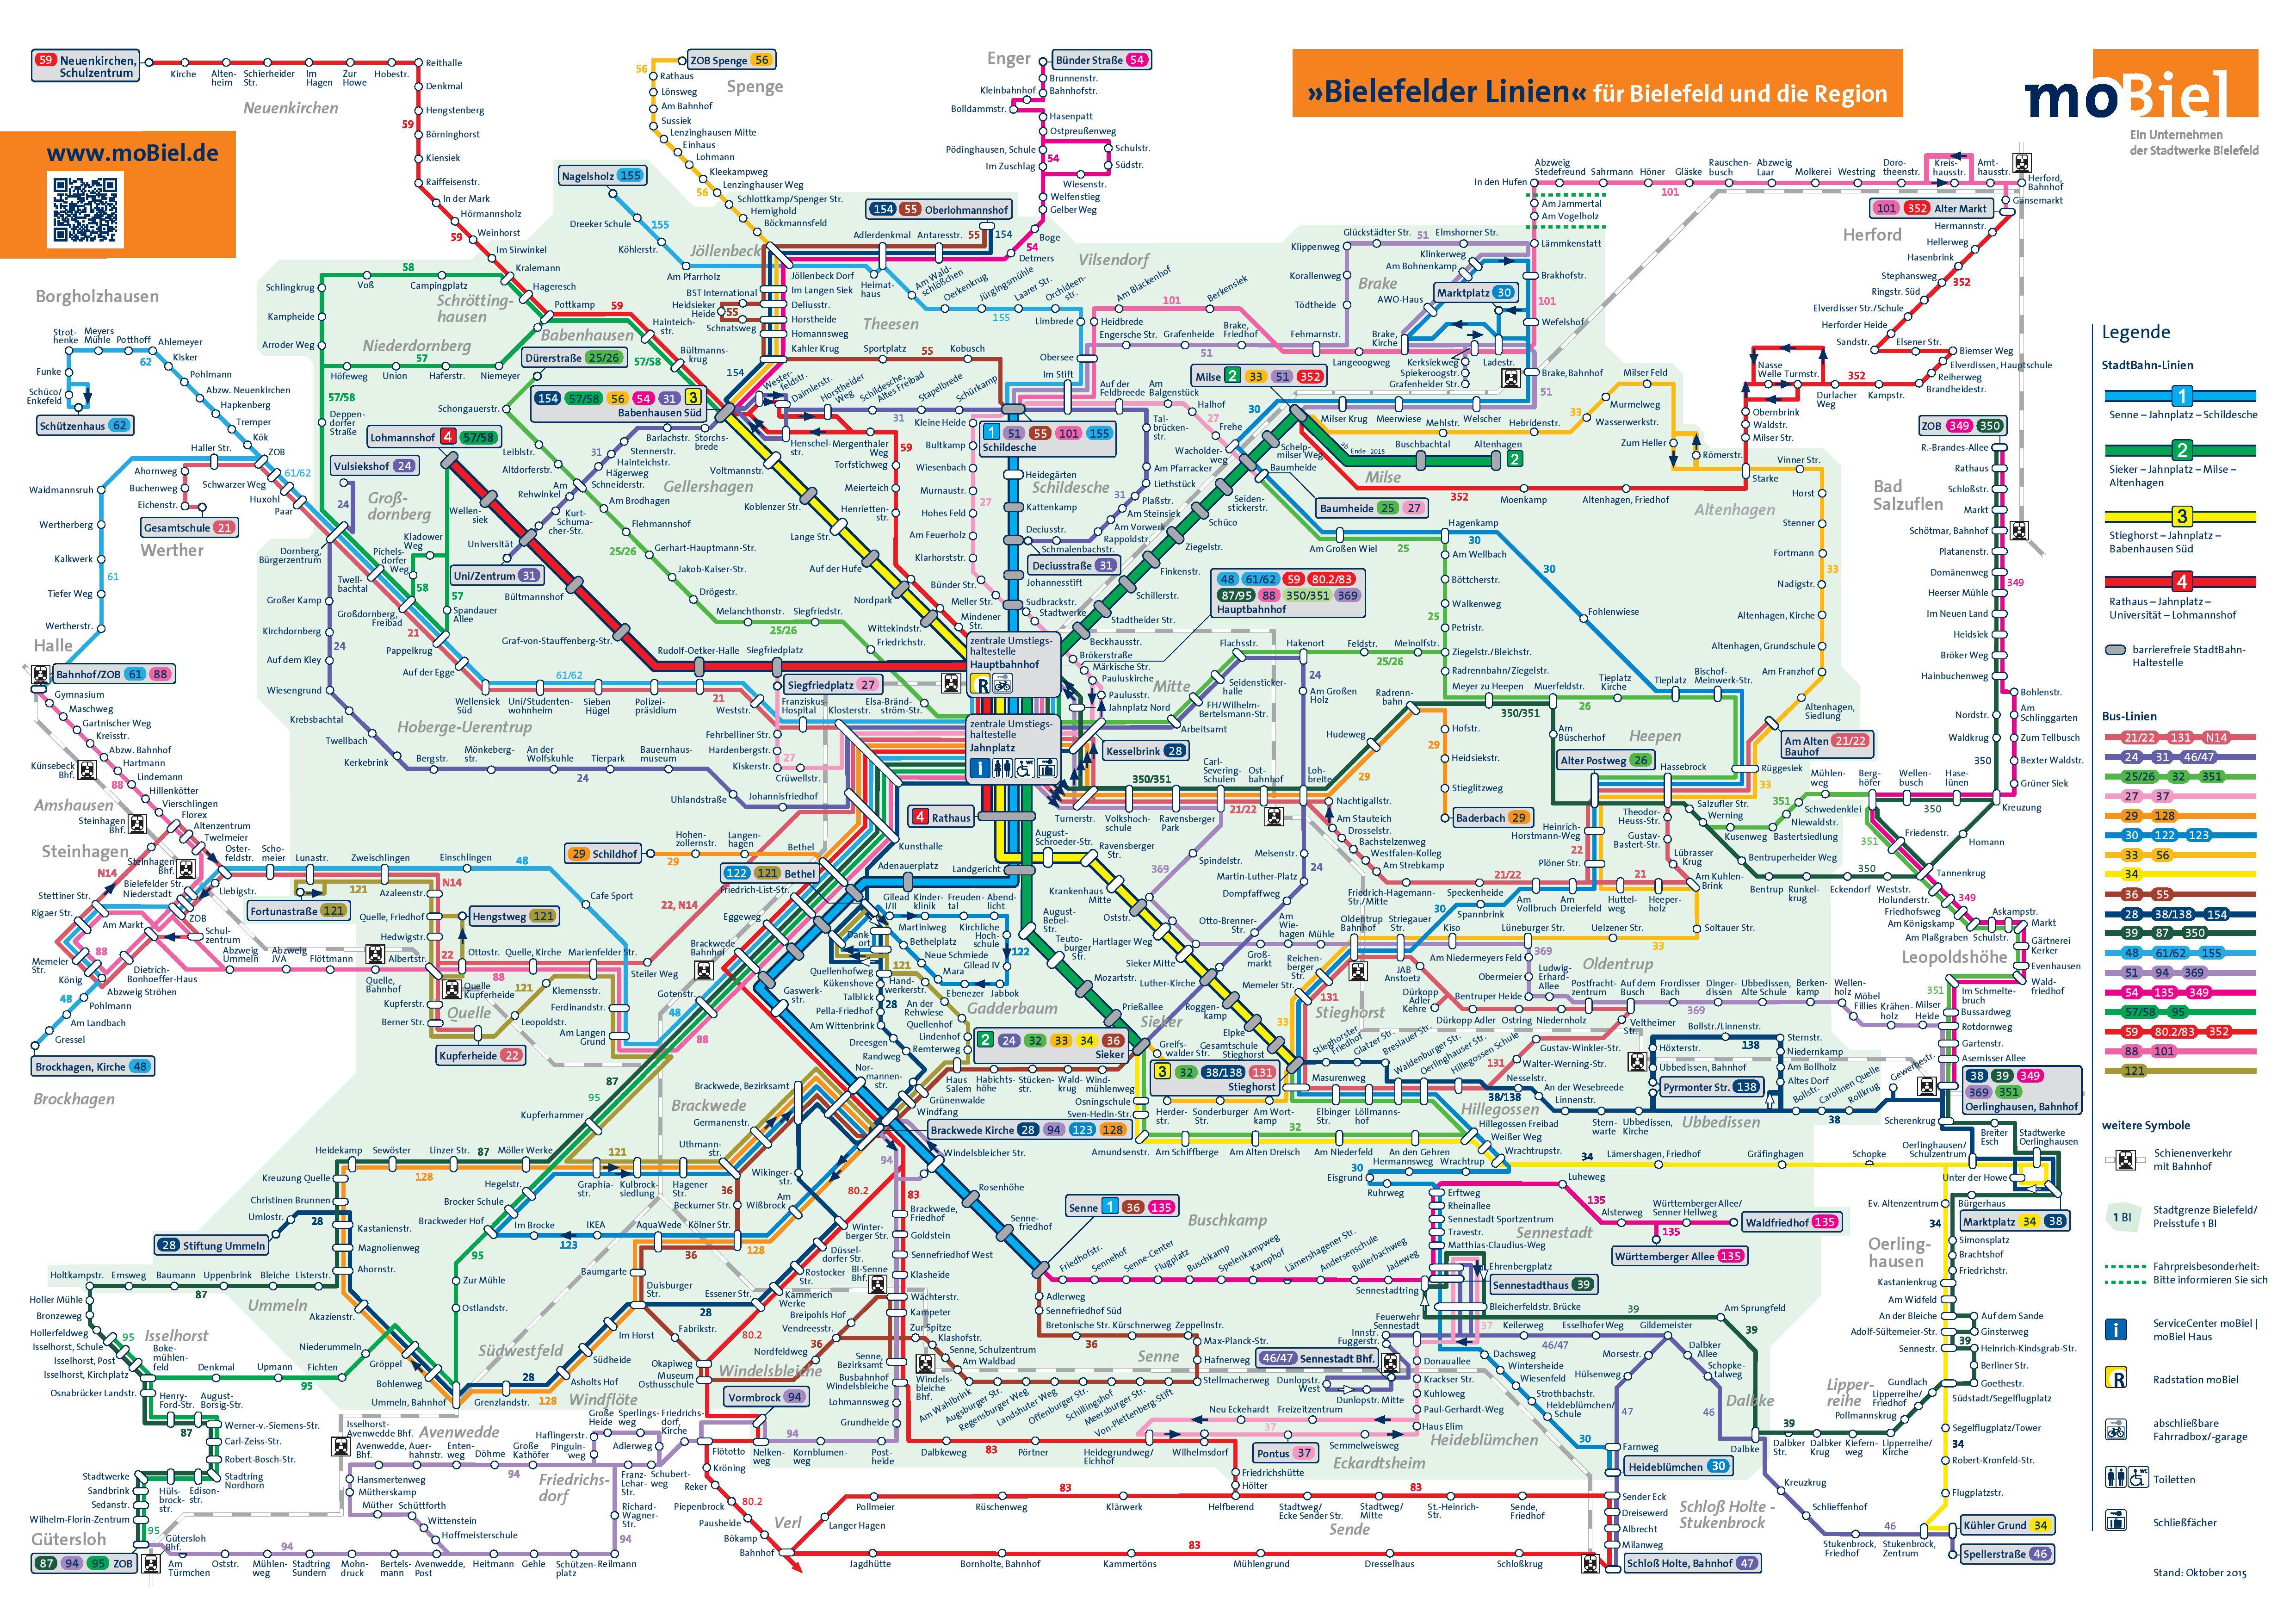 Bielefeld transport map